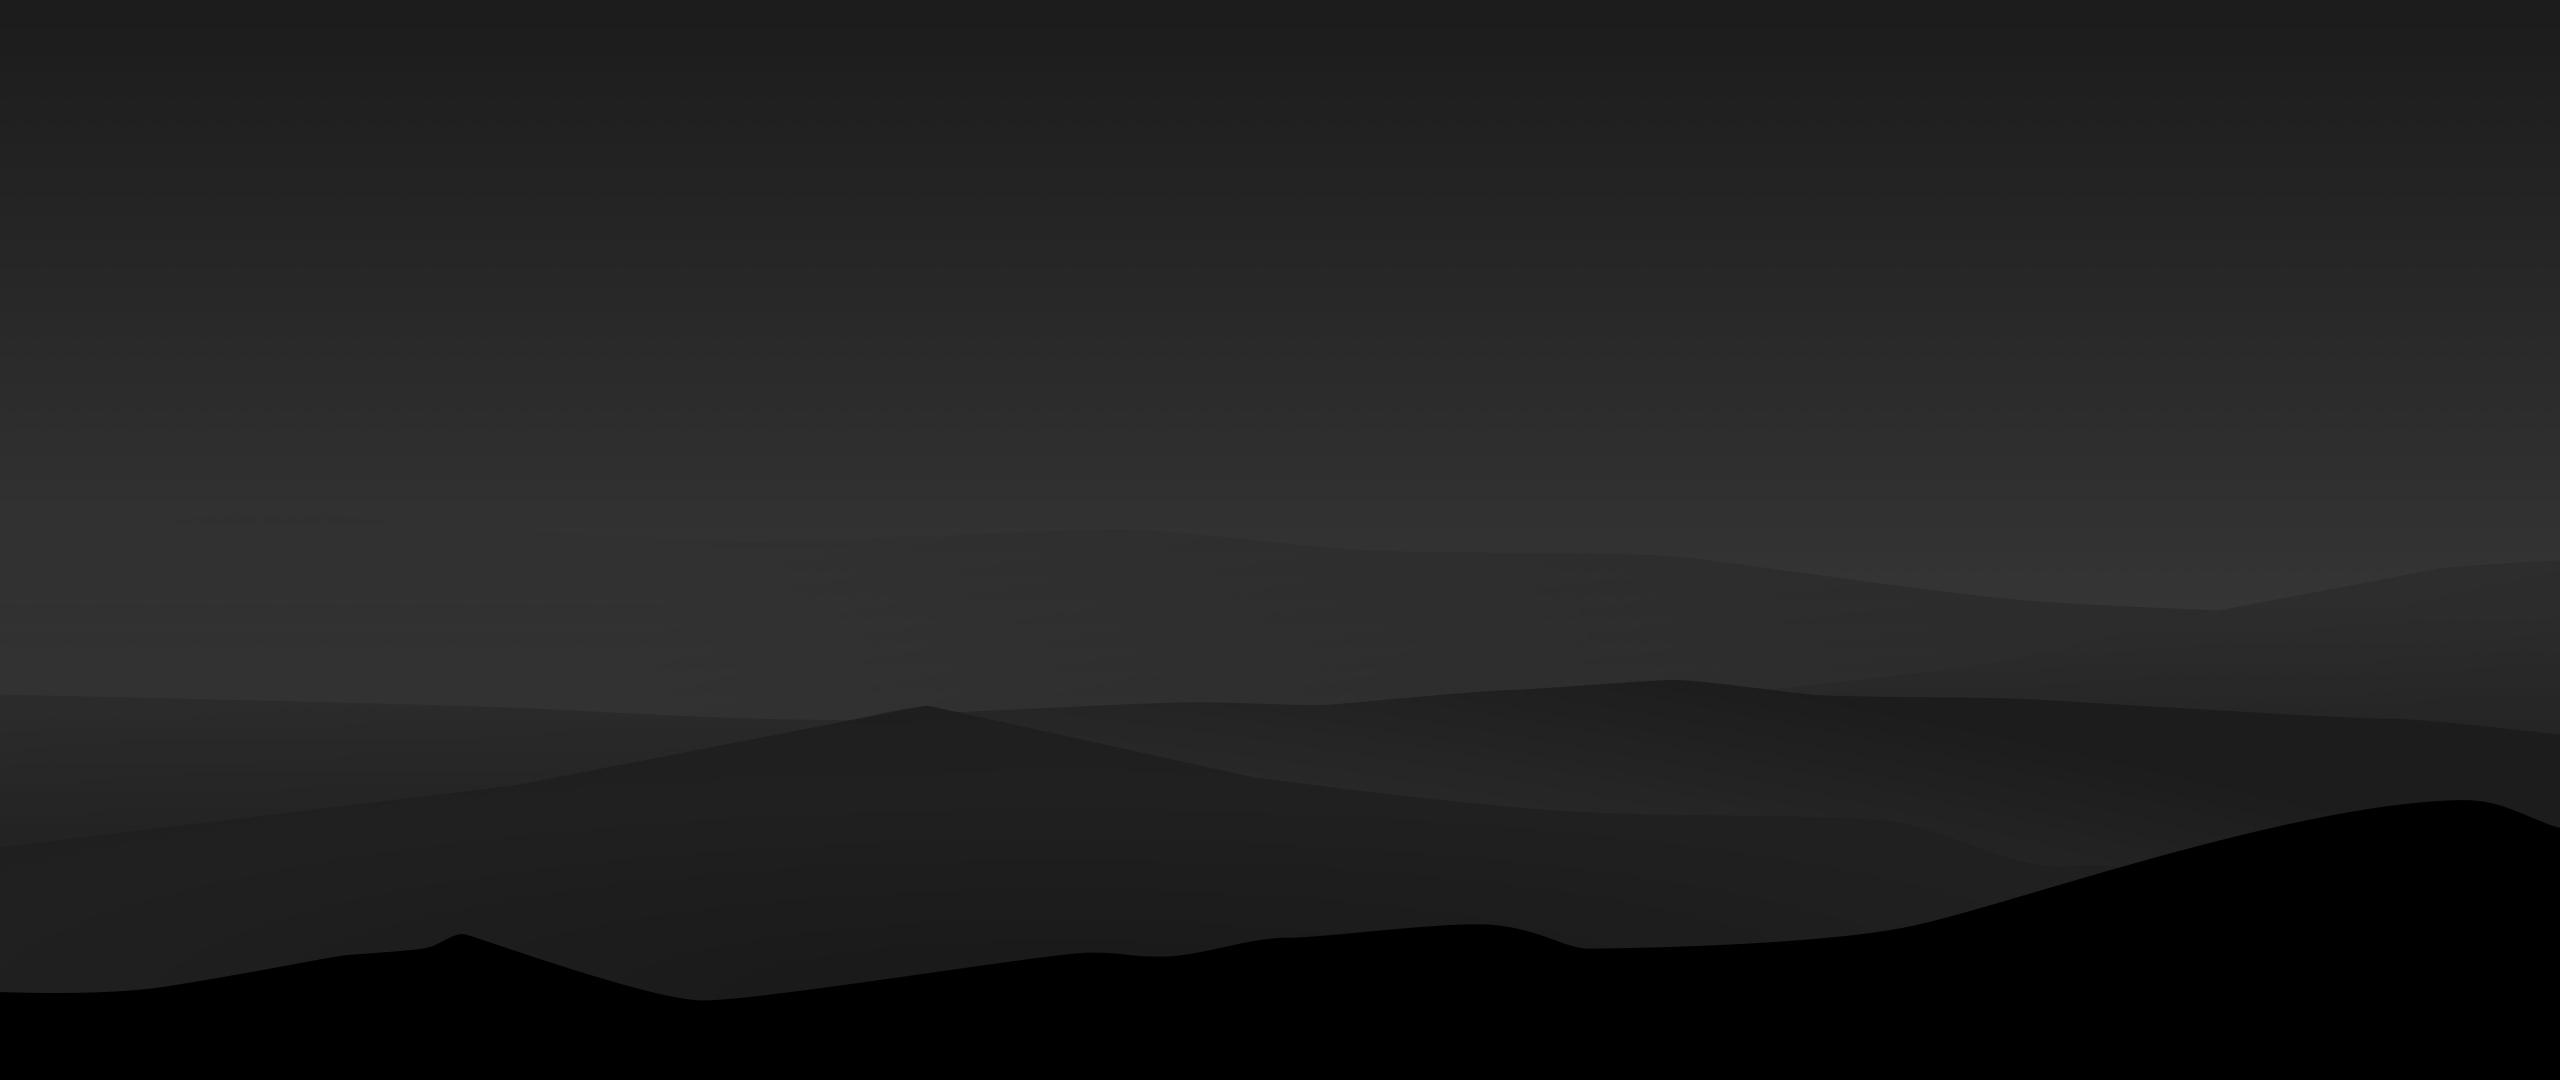 2560x1080 Dark Minimal Mountains At Night 2560x1080 ...